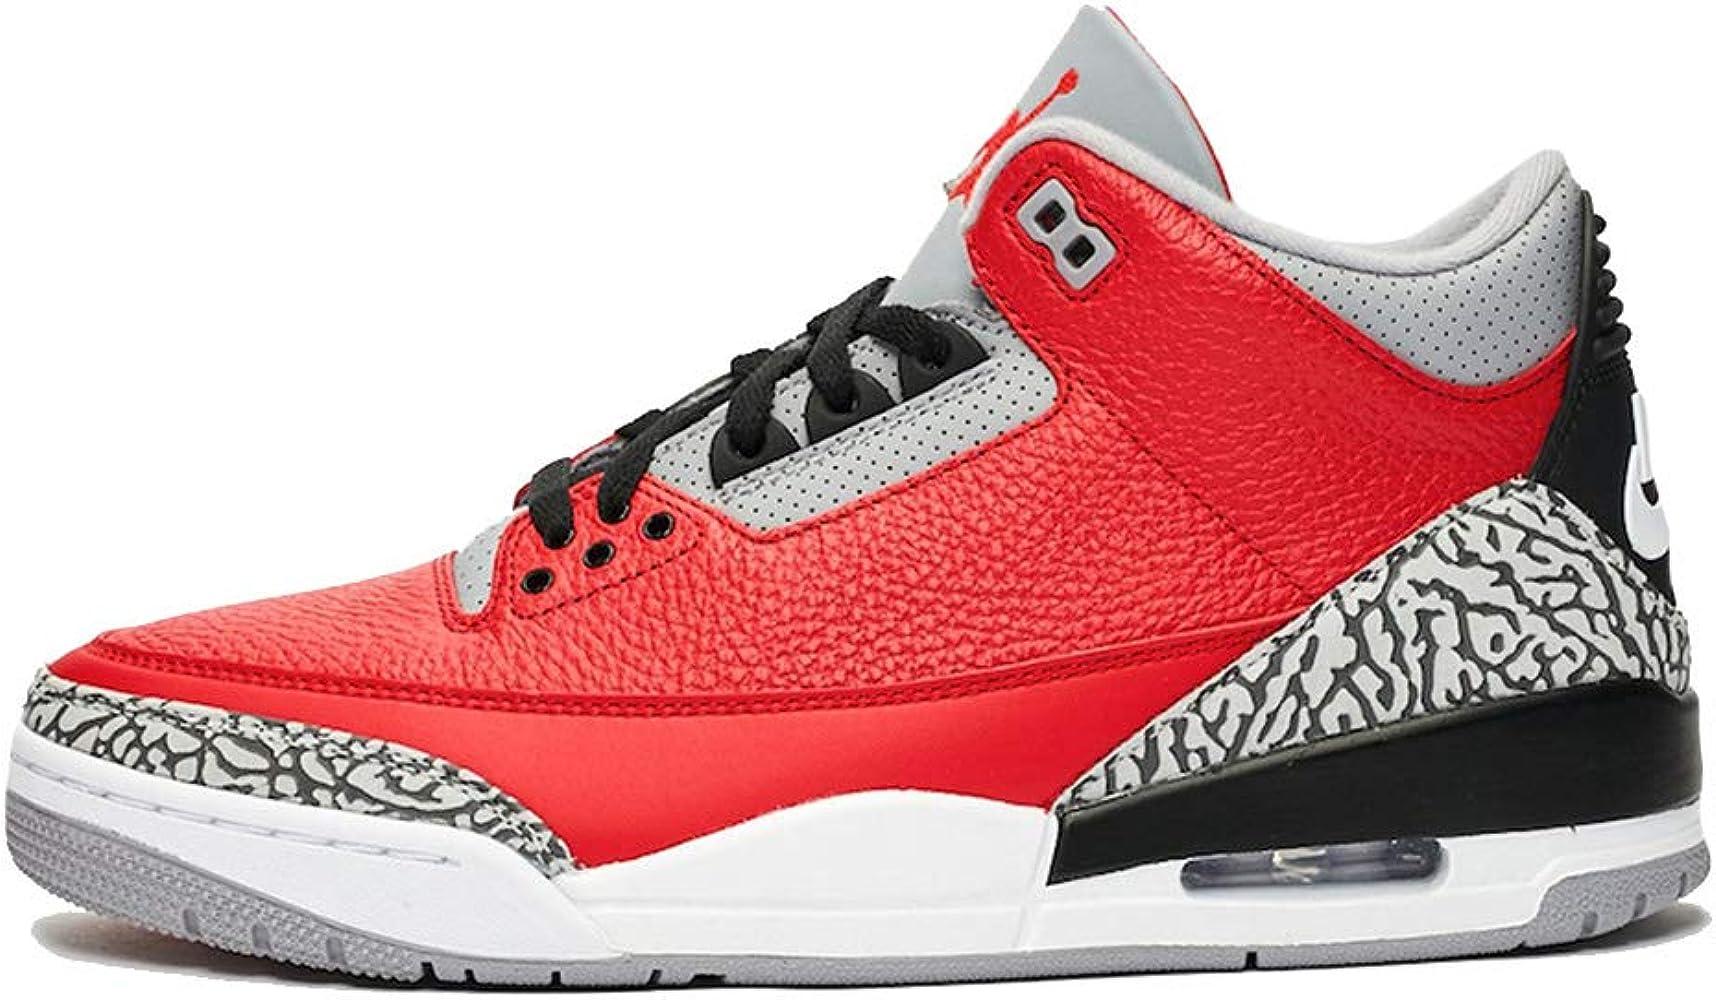 Nike Air Jordan 3 Retro III SE Unite